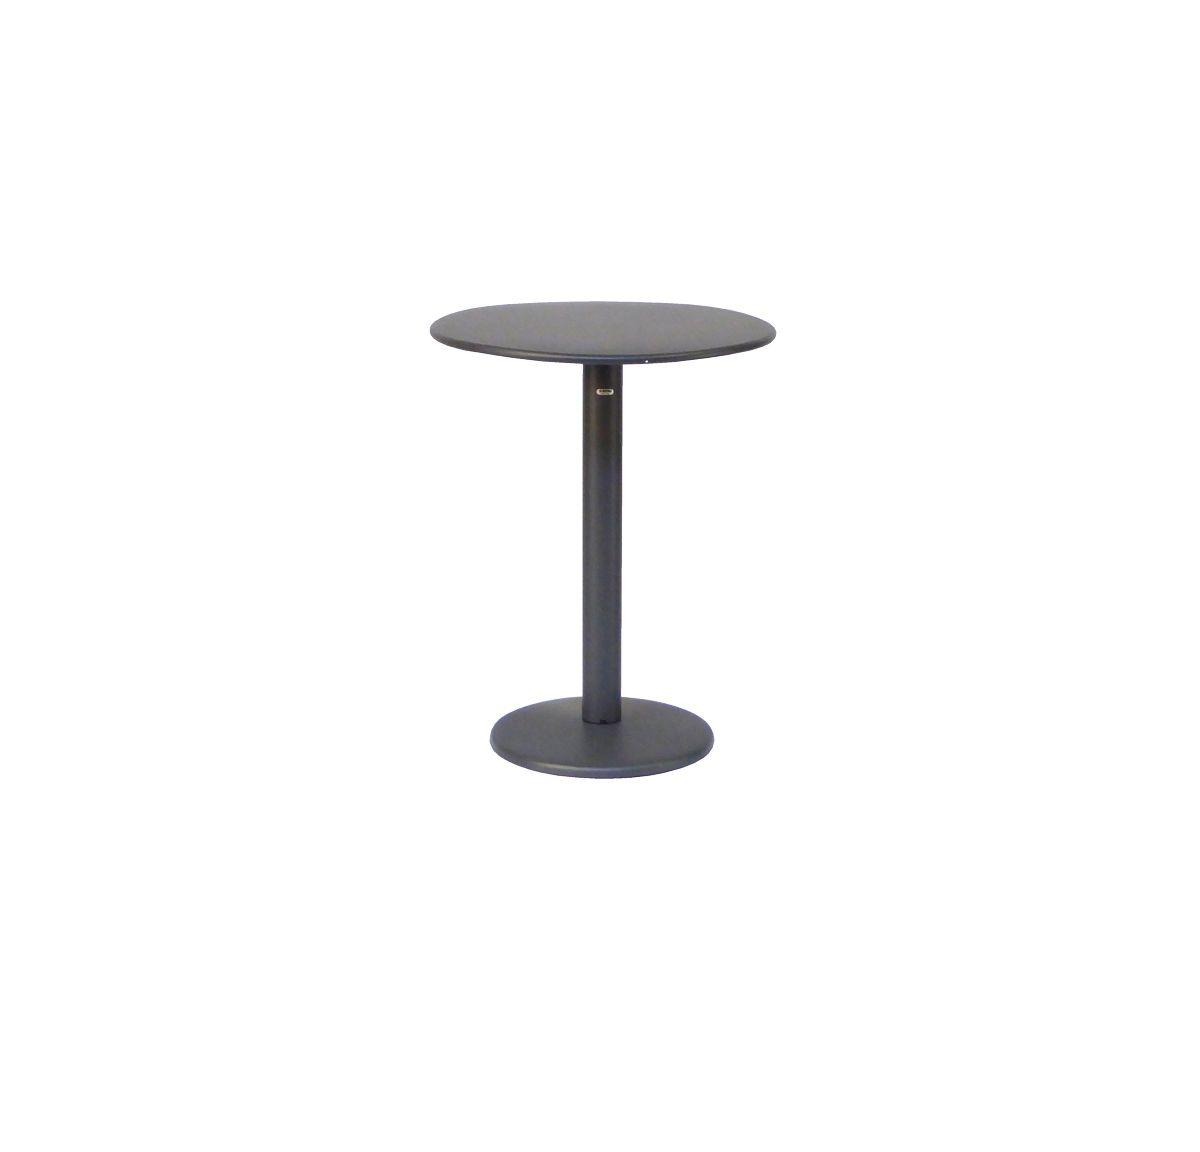 emuamericas, llc 900-22 table, outdoor